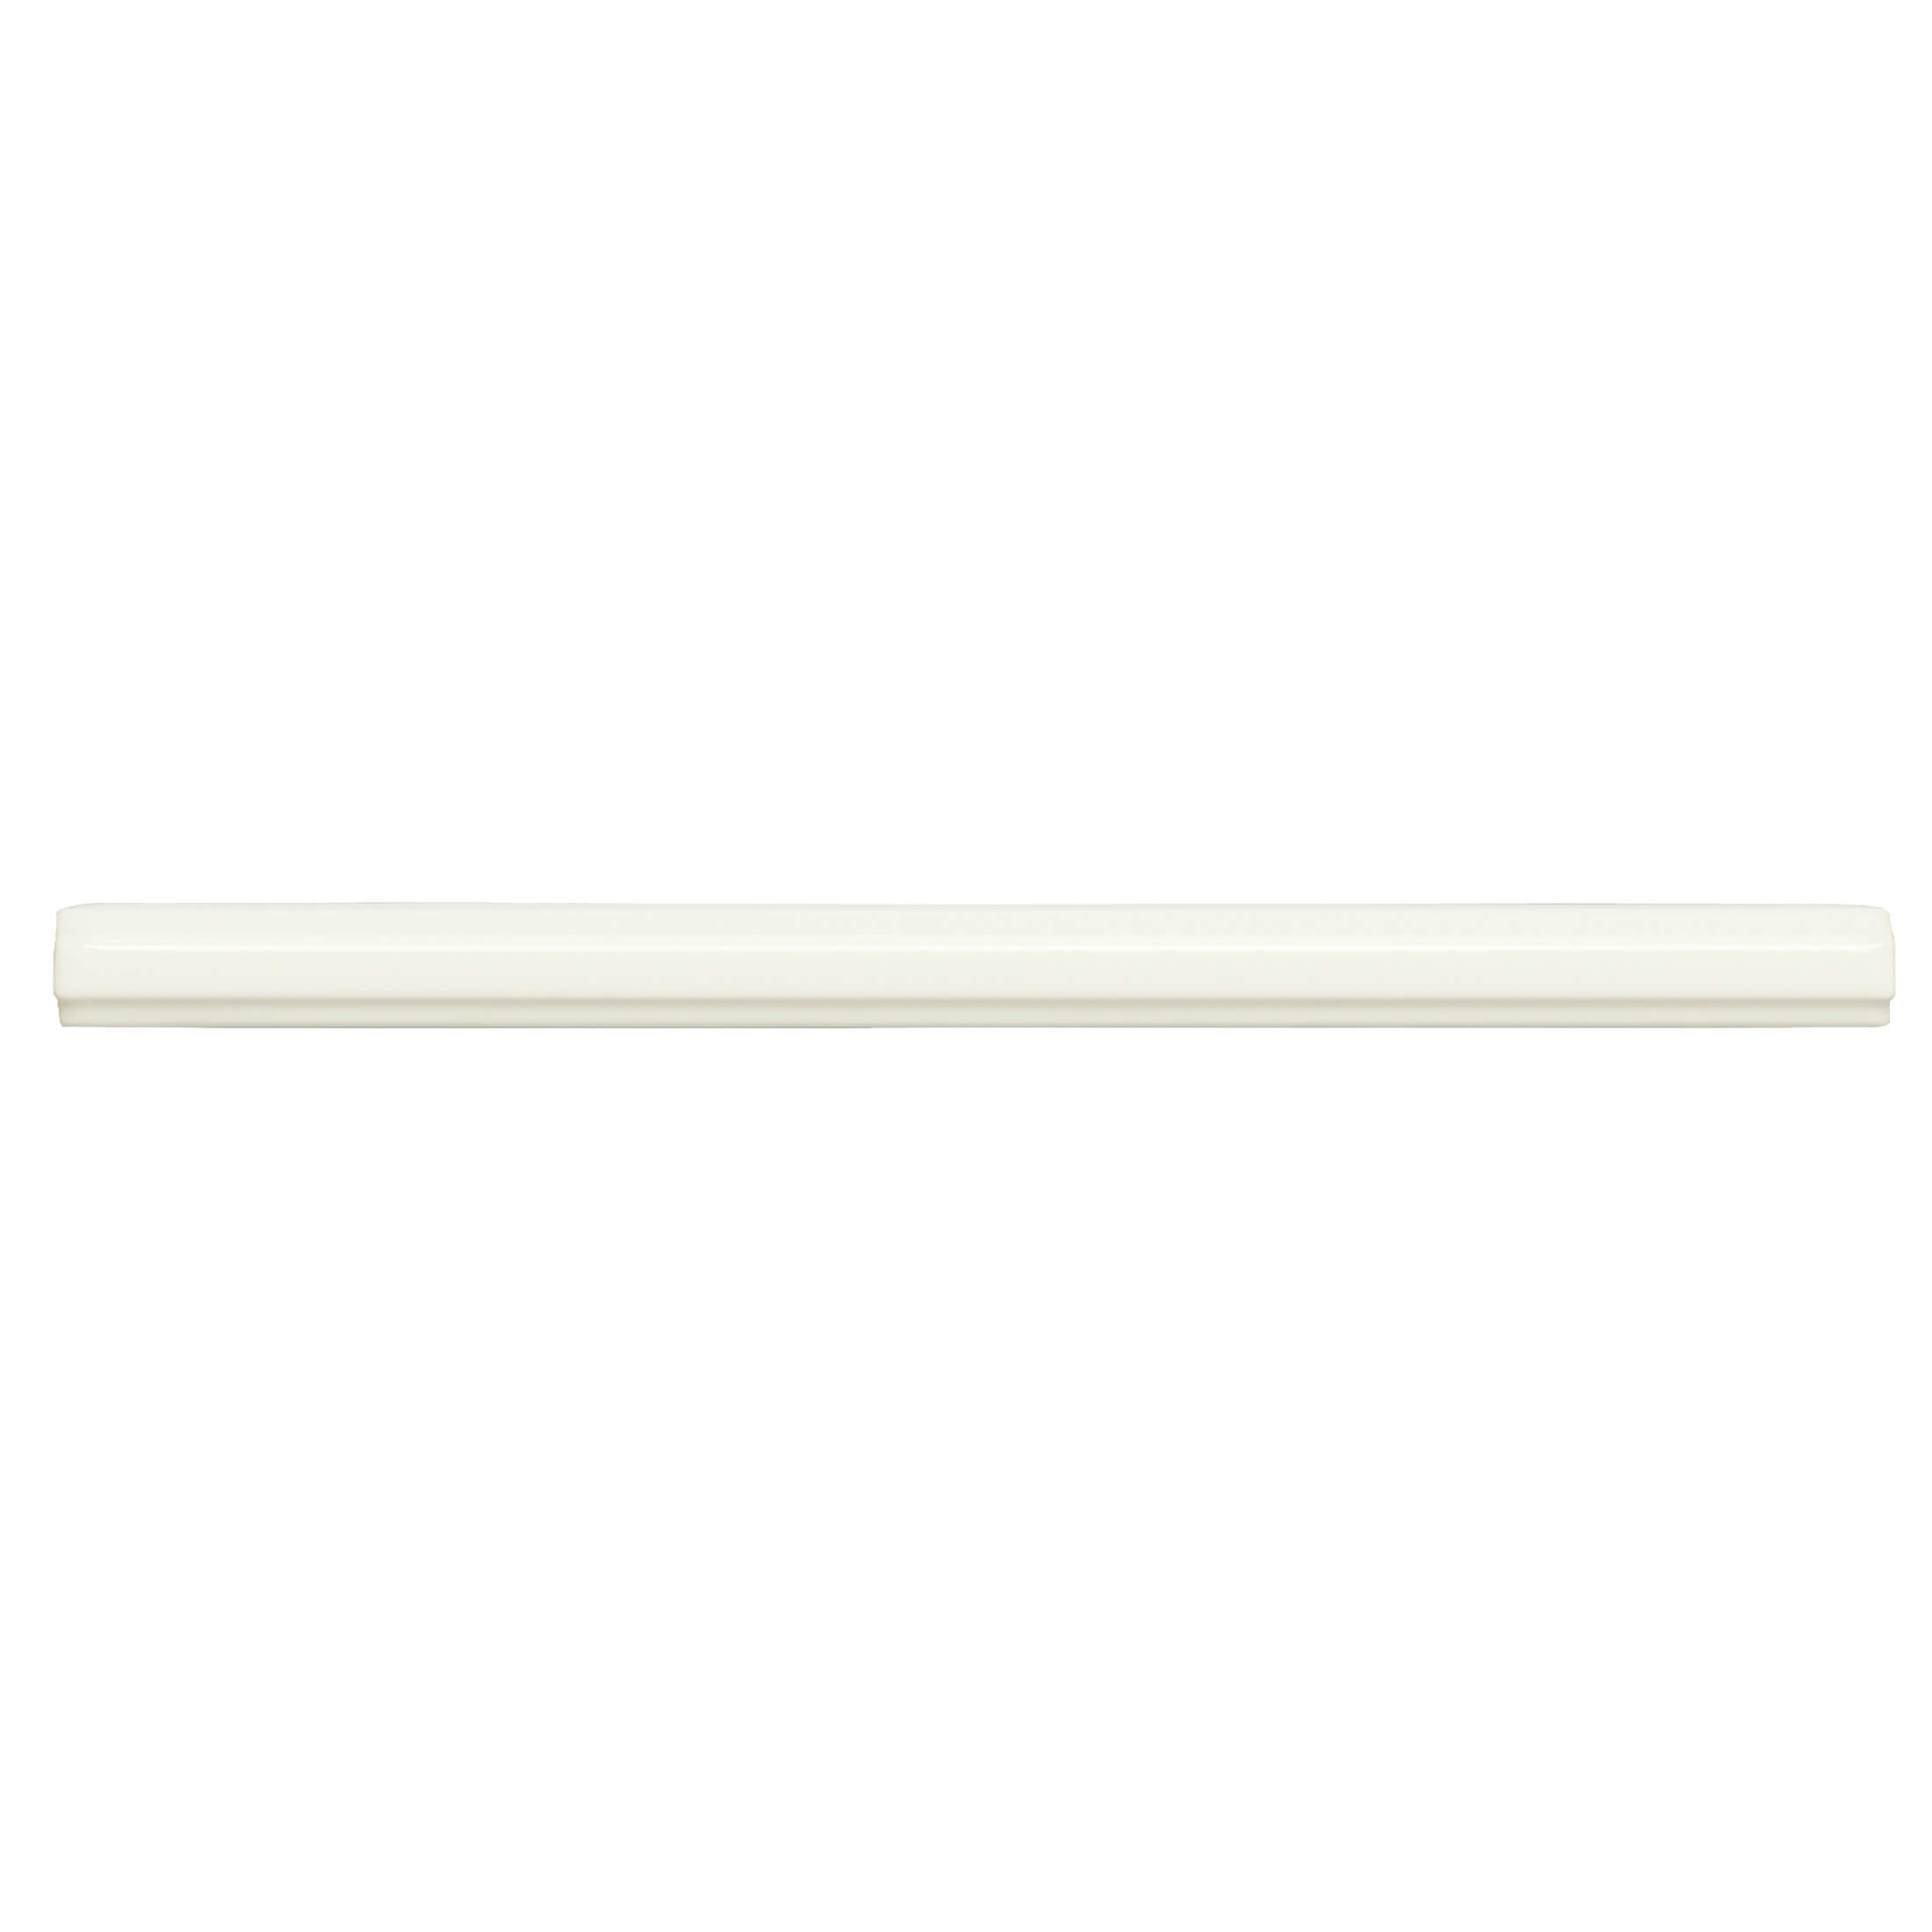 ADCT5024 - PERFIL  - 2 cm X 30 cm